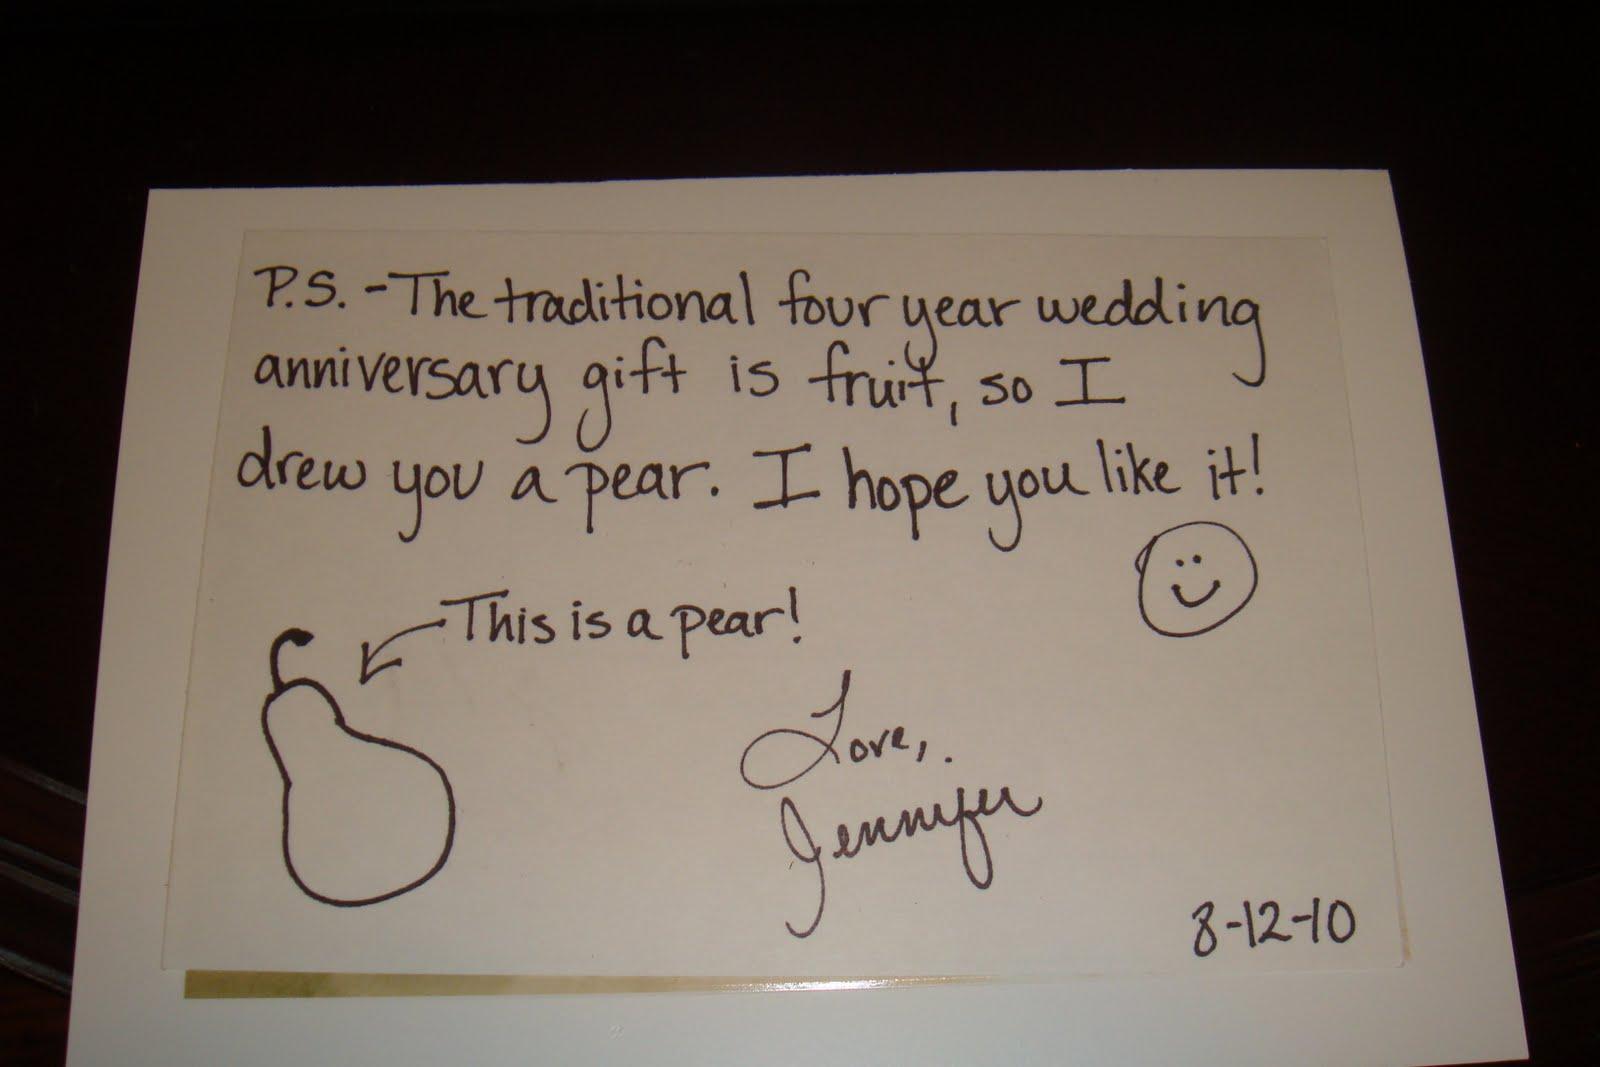 wedding anniversary gifts wedding